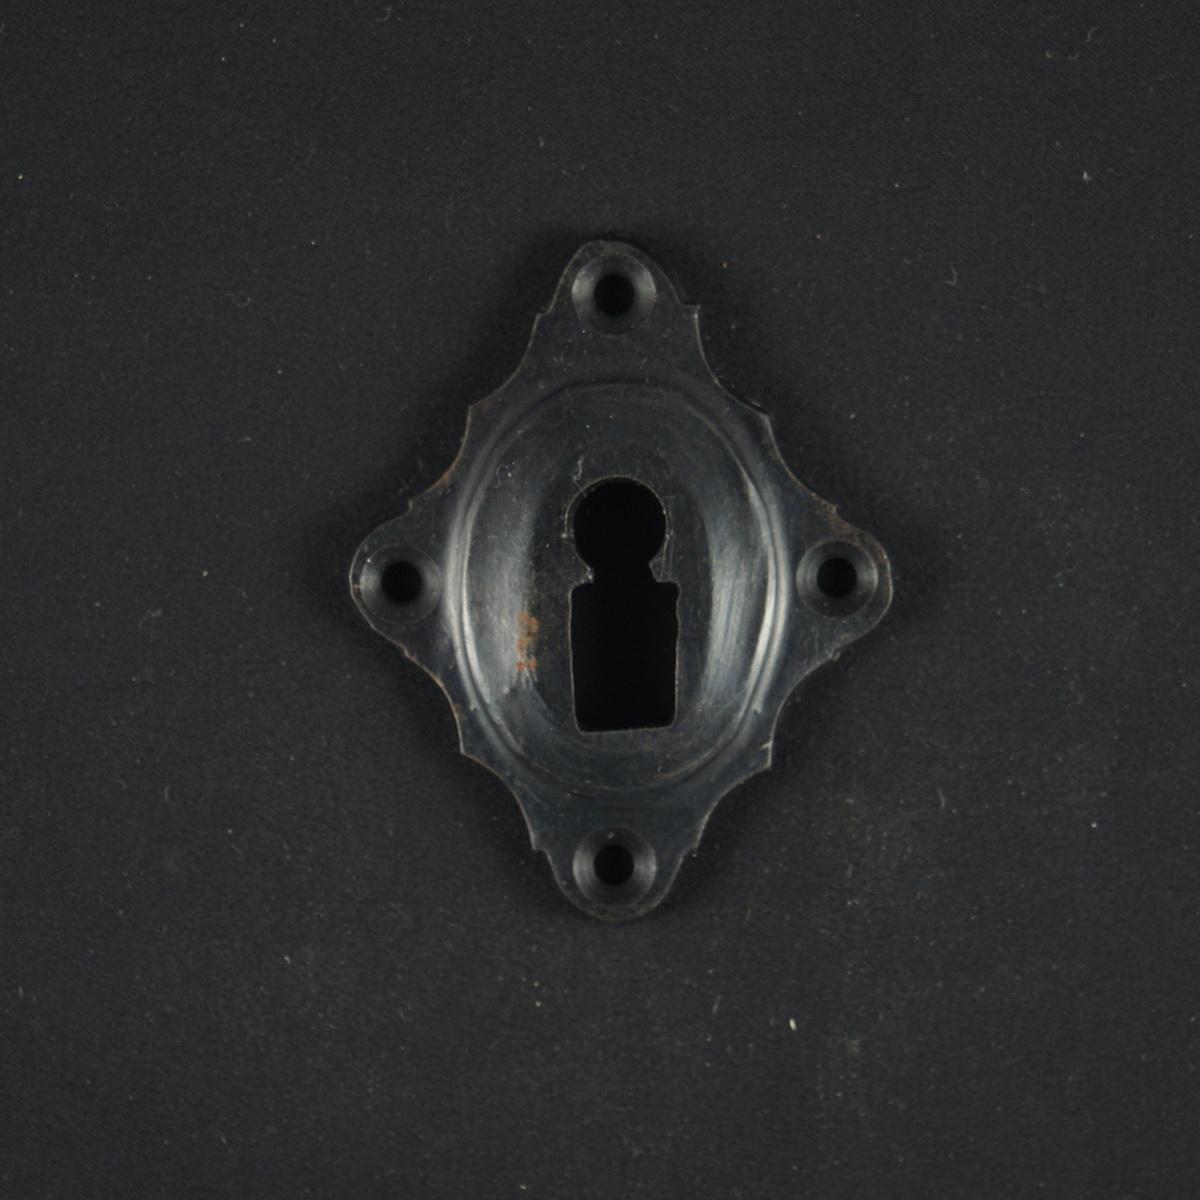 320.0025.70 Schlüsselrosette - antike Tür Rosette, Zierrosette, Türbeschlag